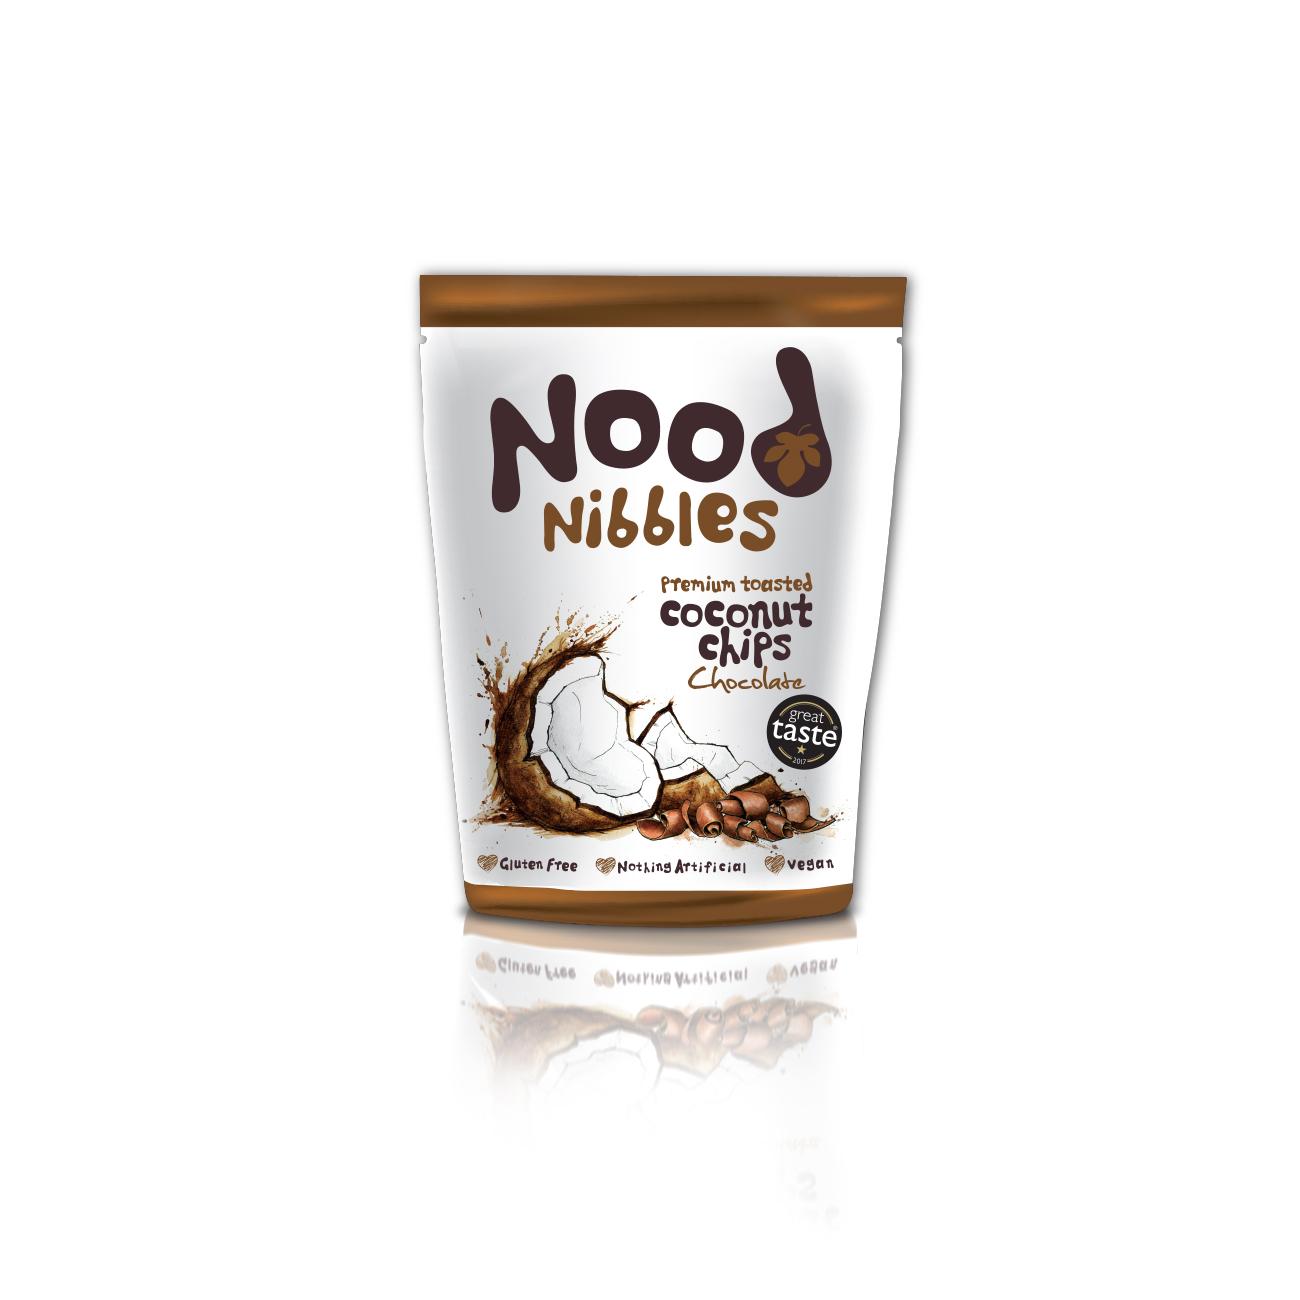 Nood_Chocolate.jpg